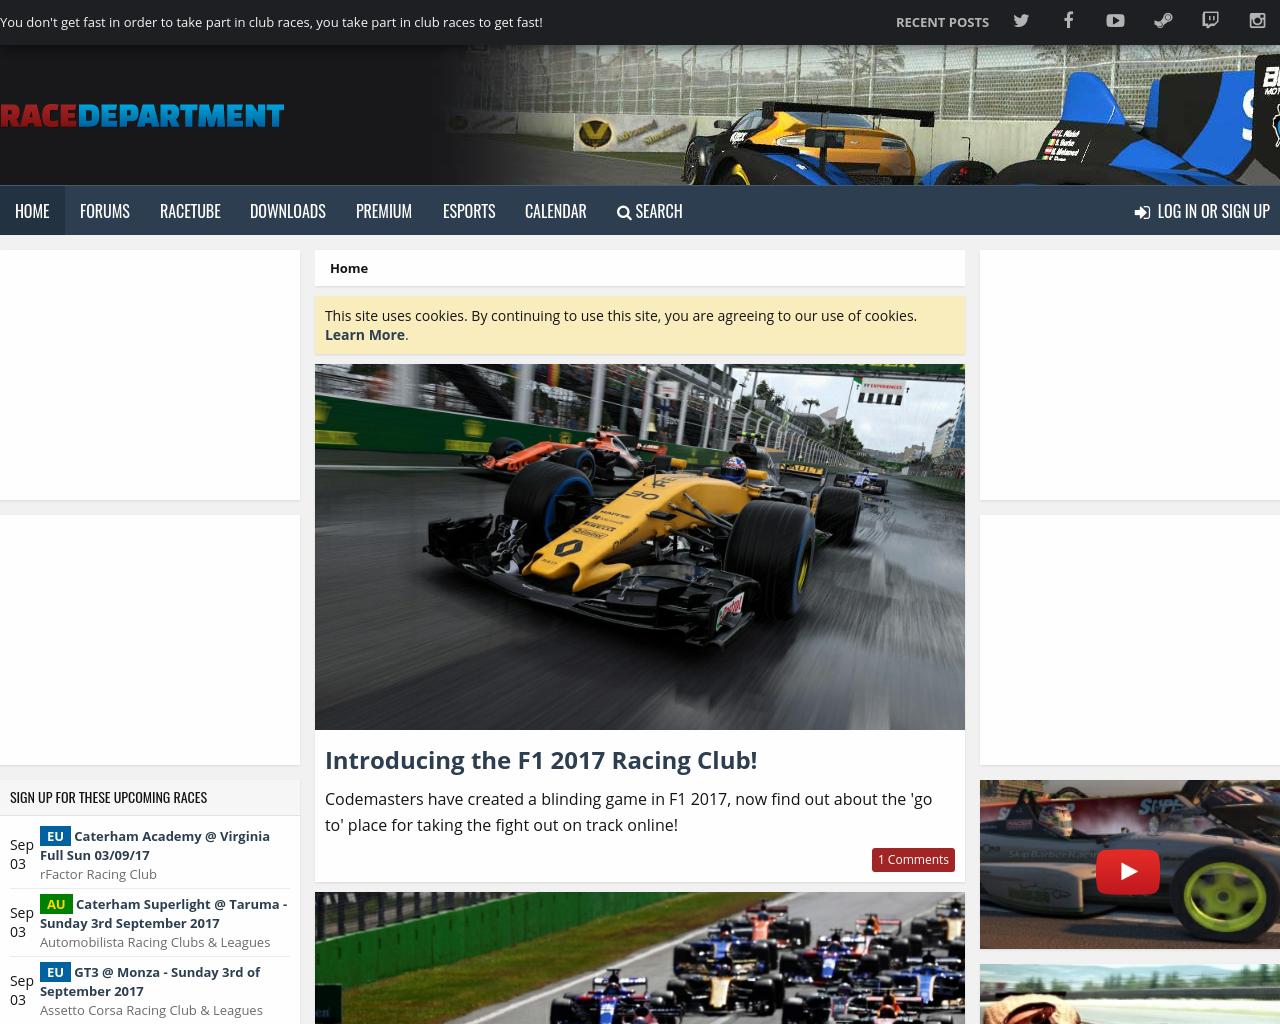 RACEDEPARTMENT-Advertising-Reviews-Pricing